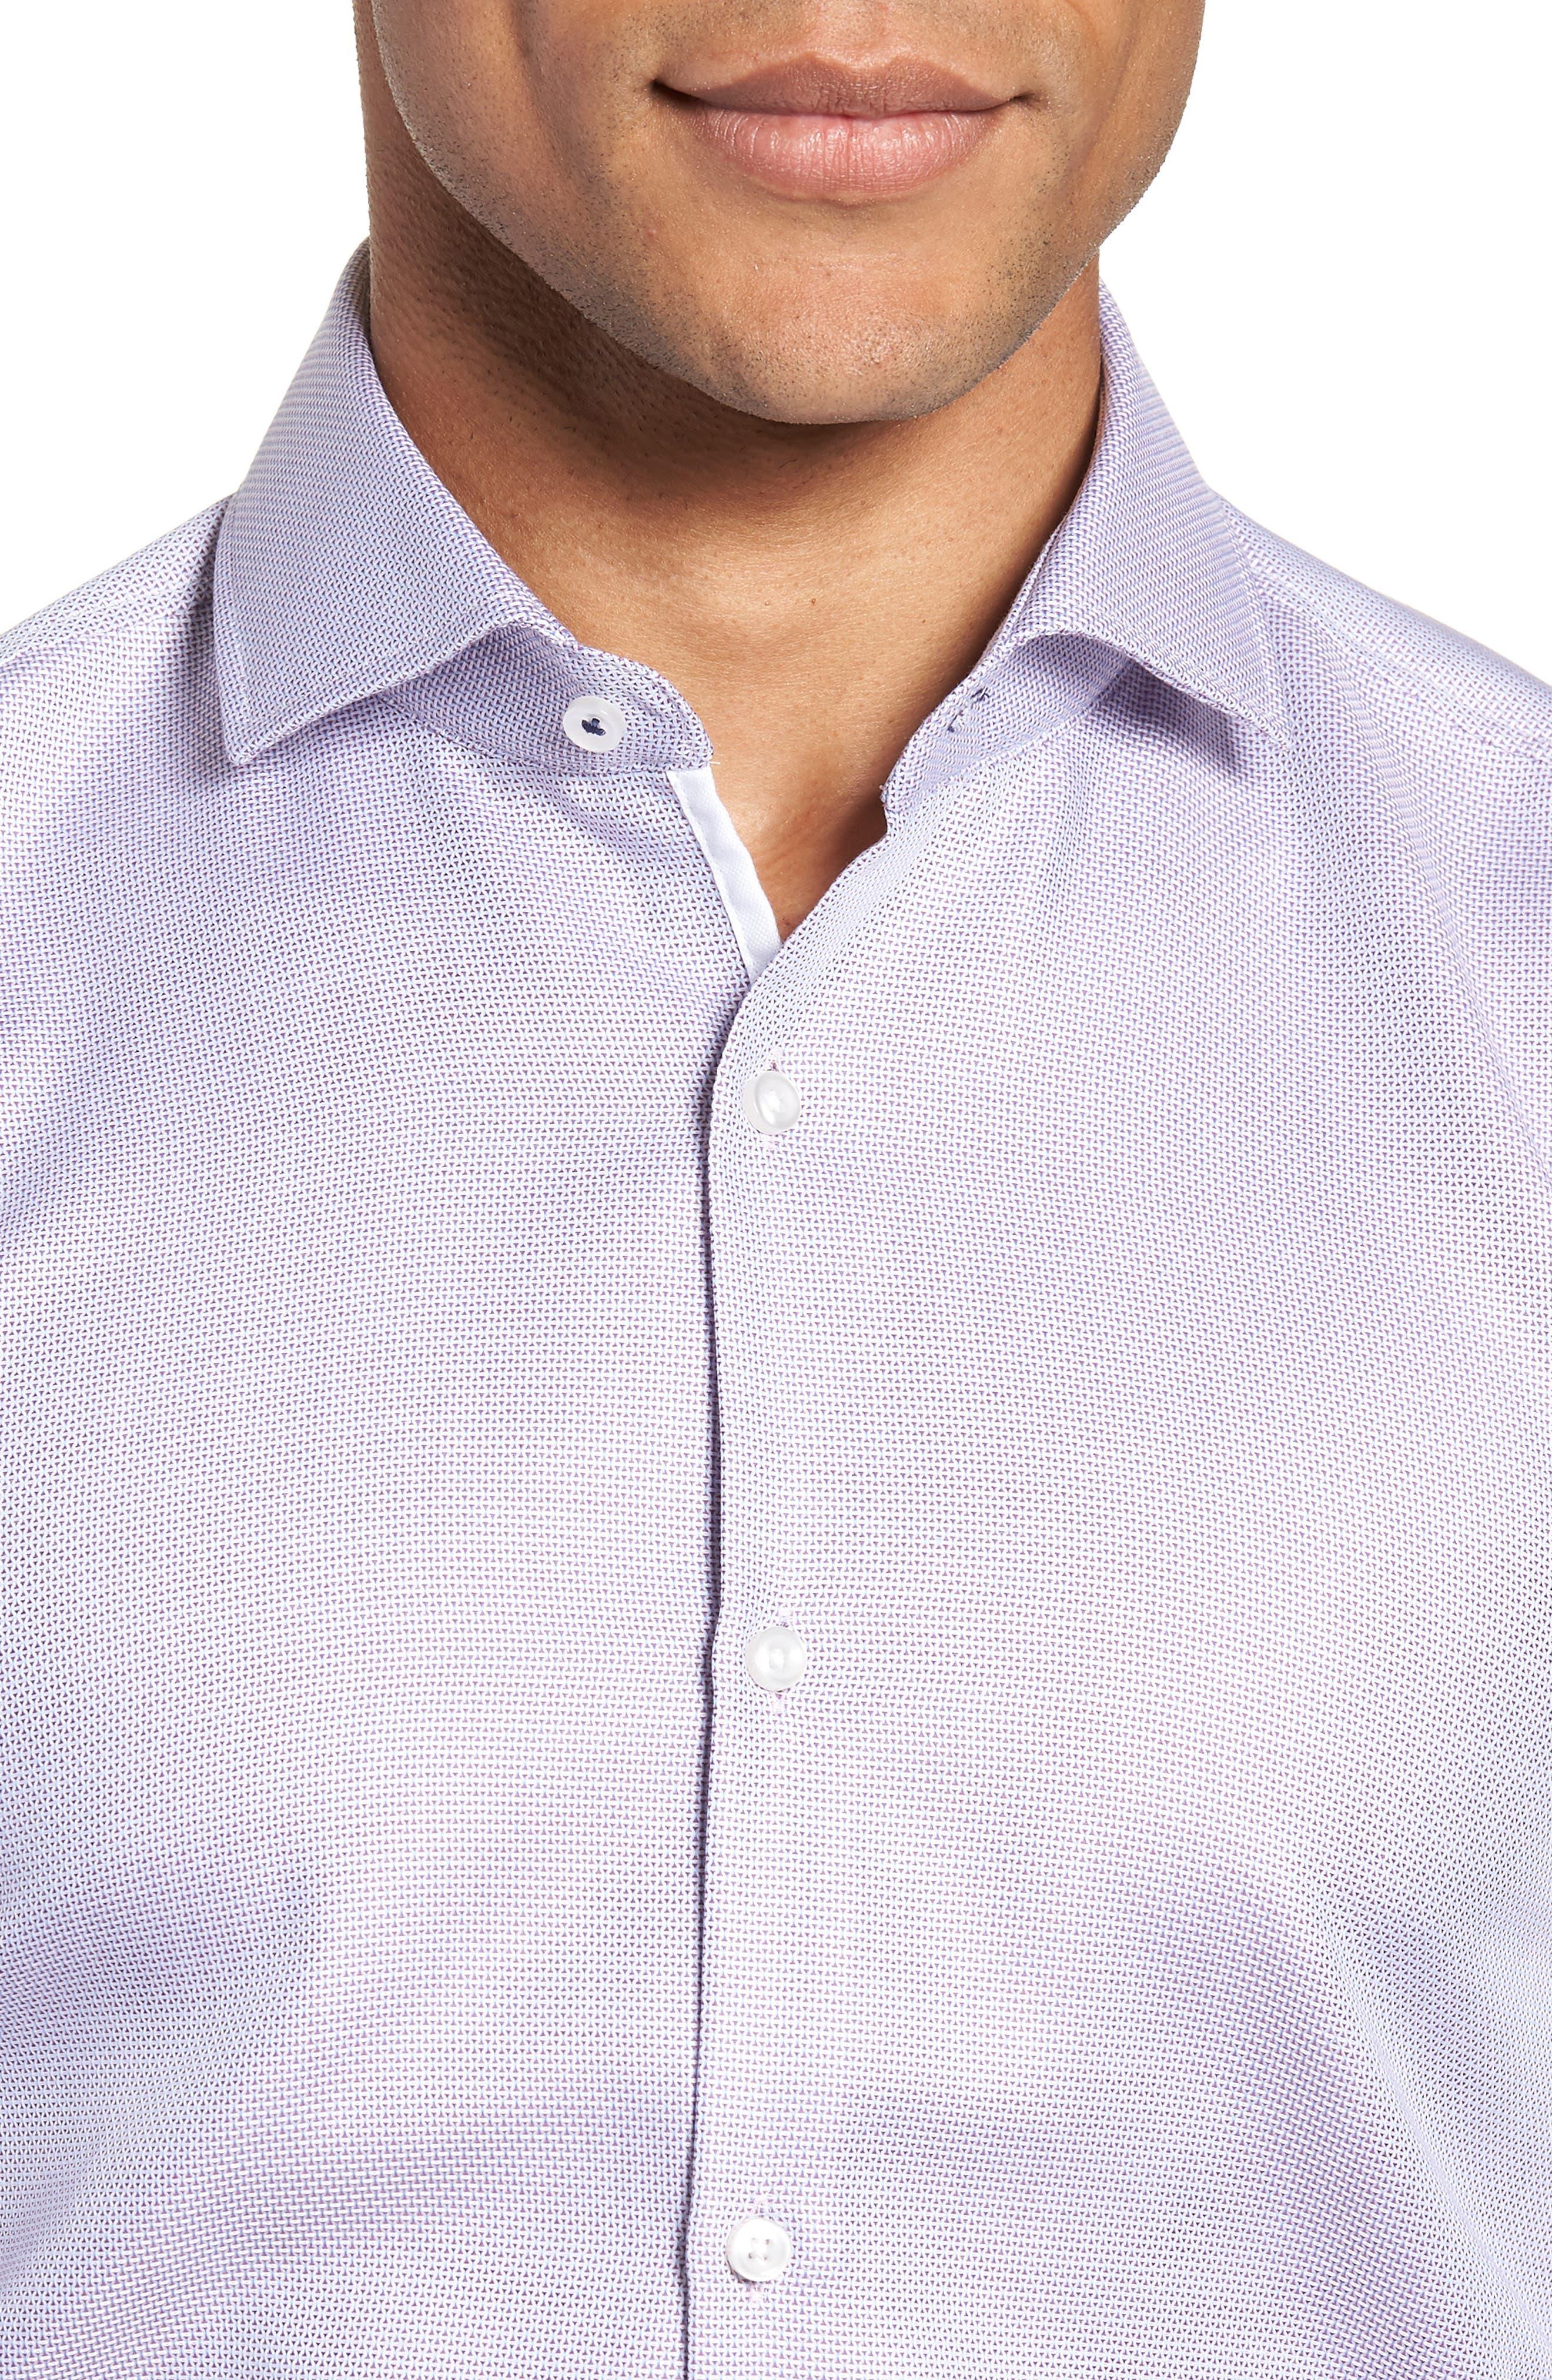 x Nordstrom Jerrin Slim Fit Solid Dress Shirt,                             Alternate thumbnail 2, color,                             LAVENDER